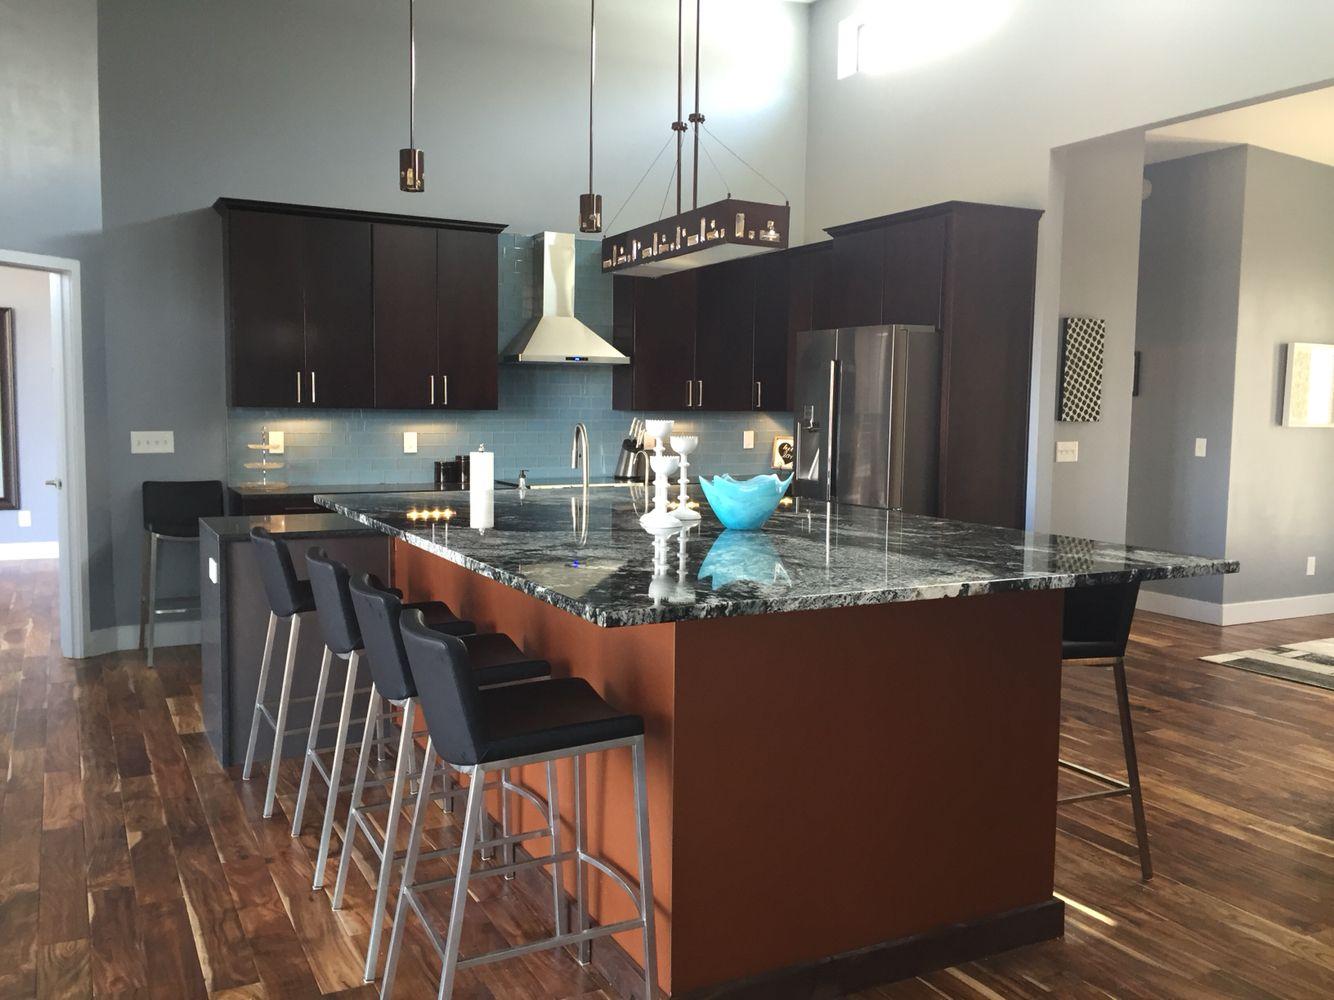 Kabinart Cabinets With Granite